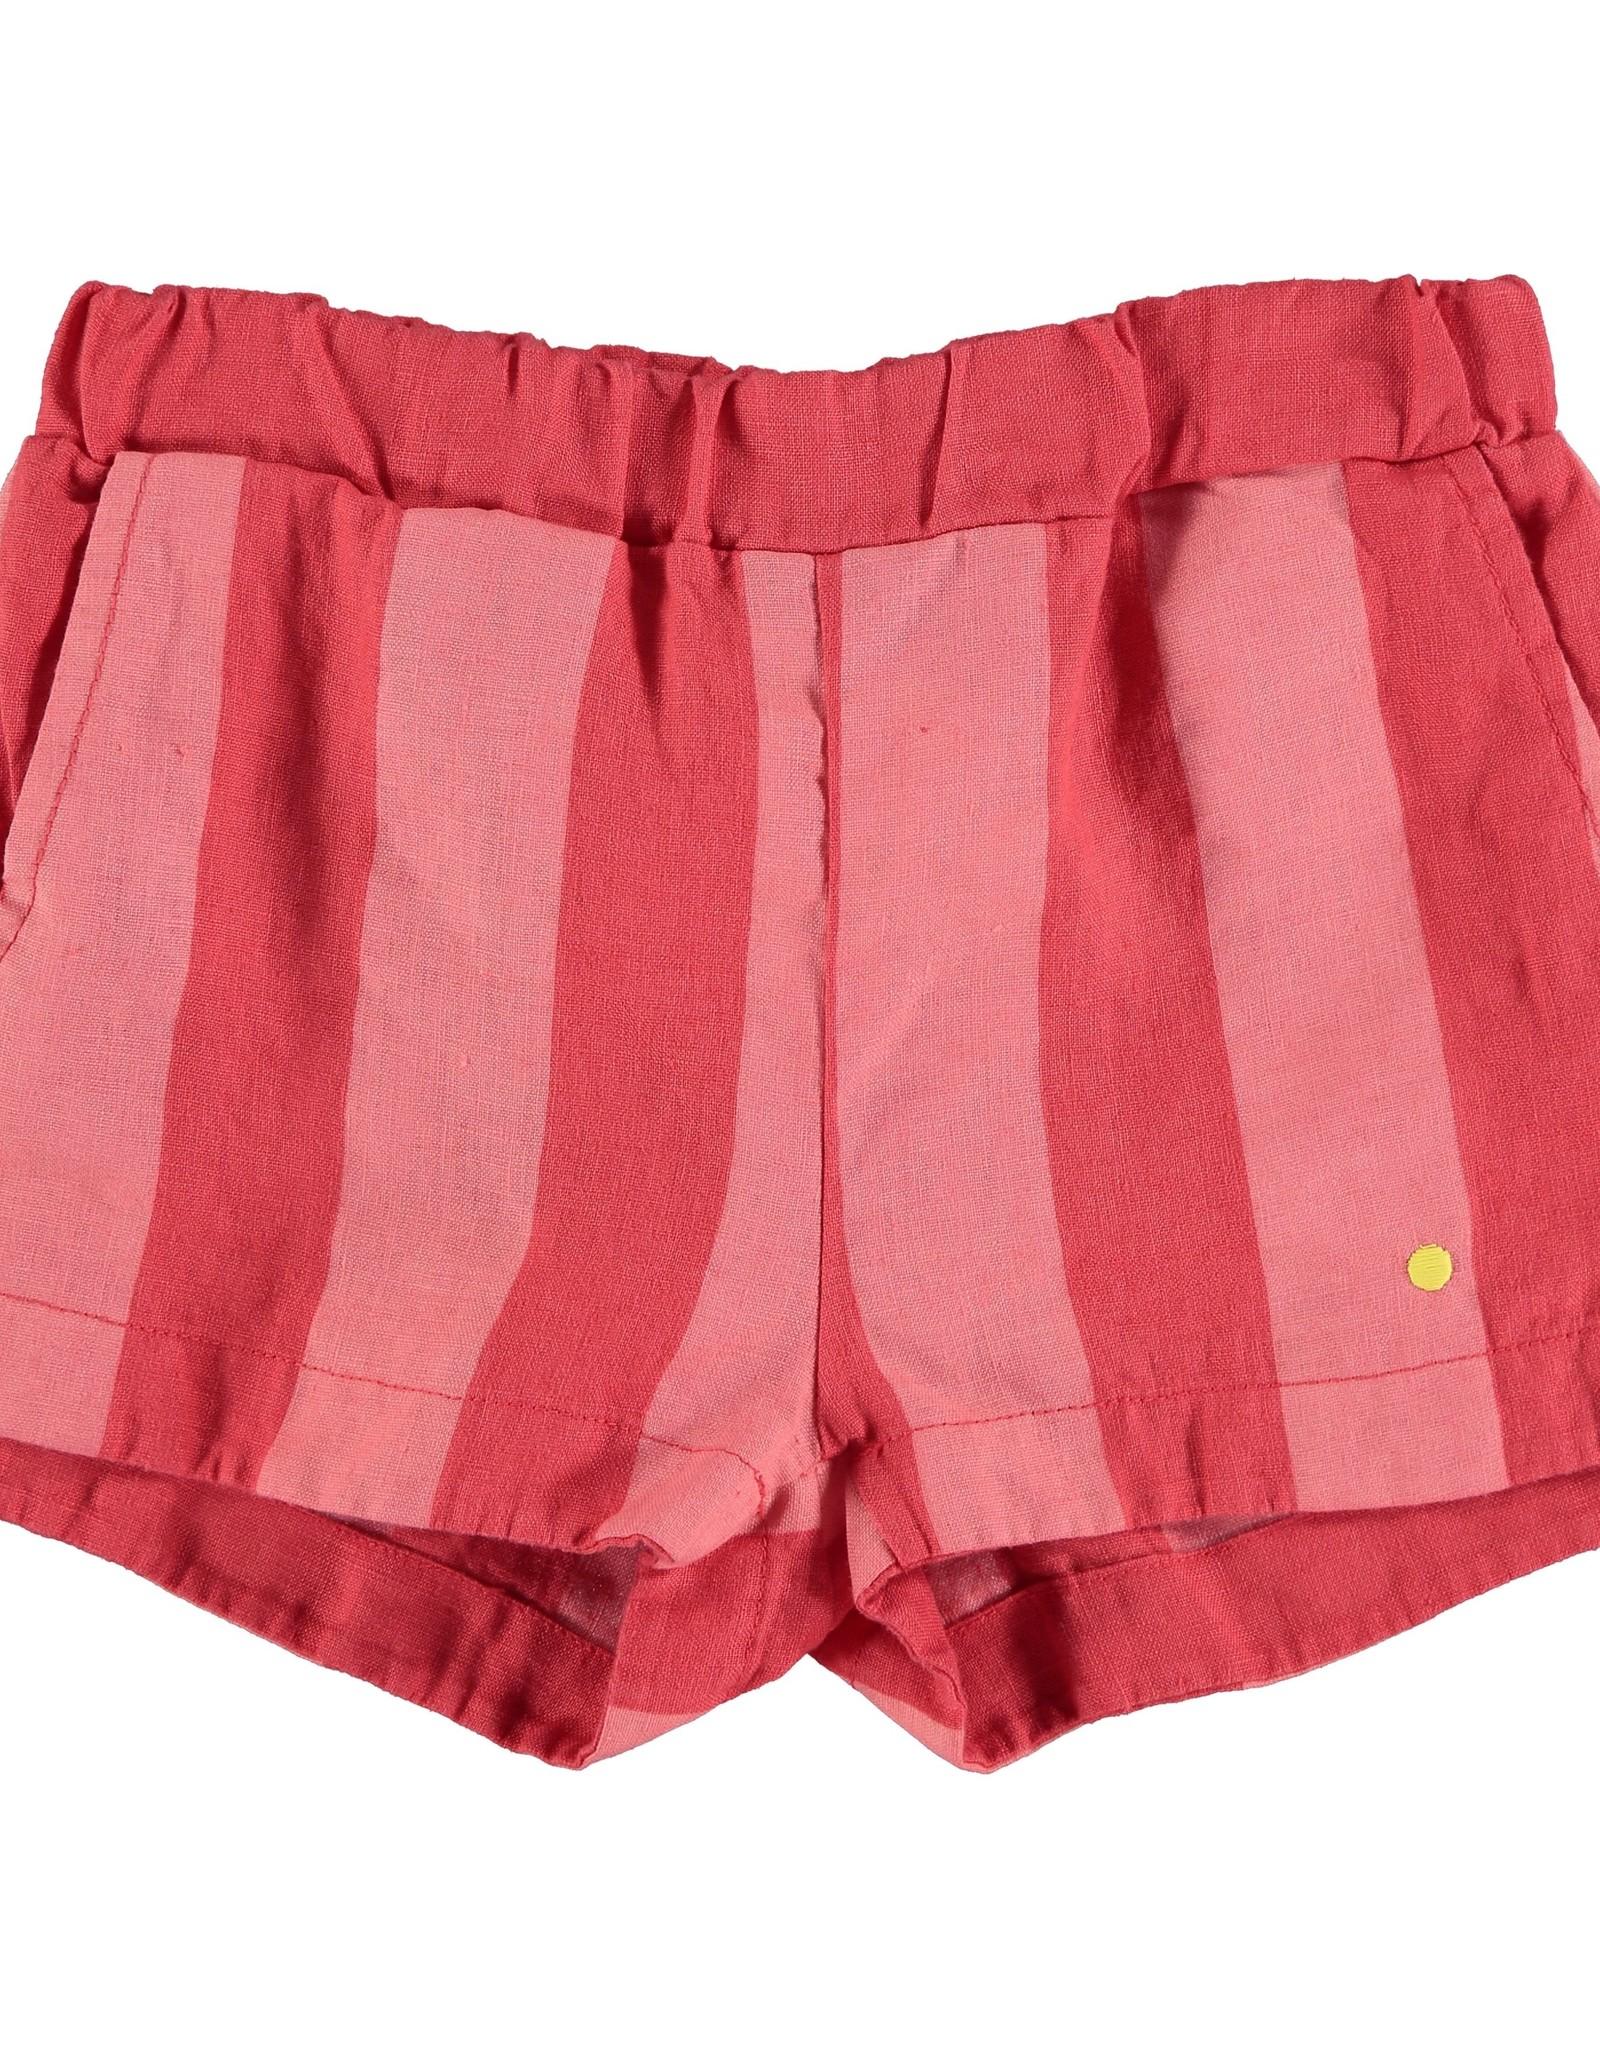 Bonmot Organic Bonmot Organic gestreept rood linnen broekje